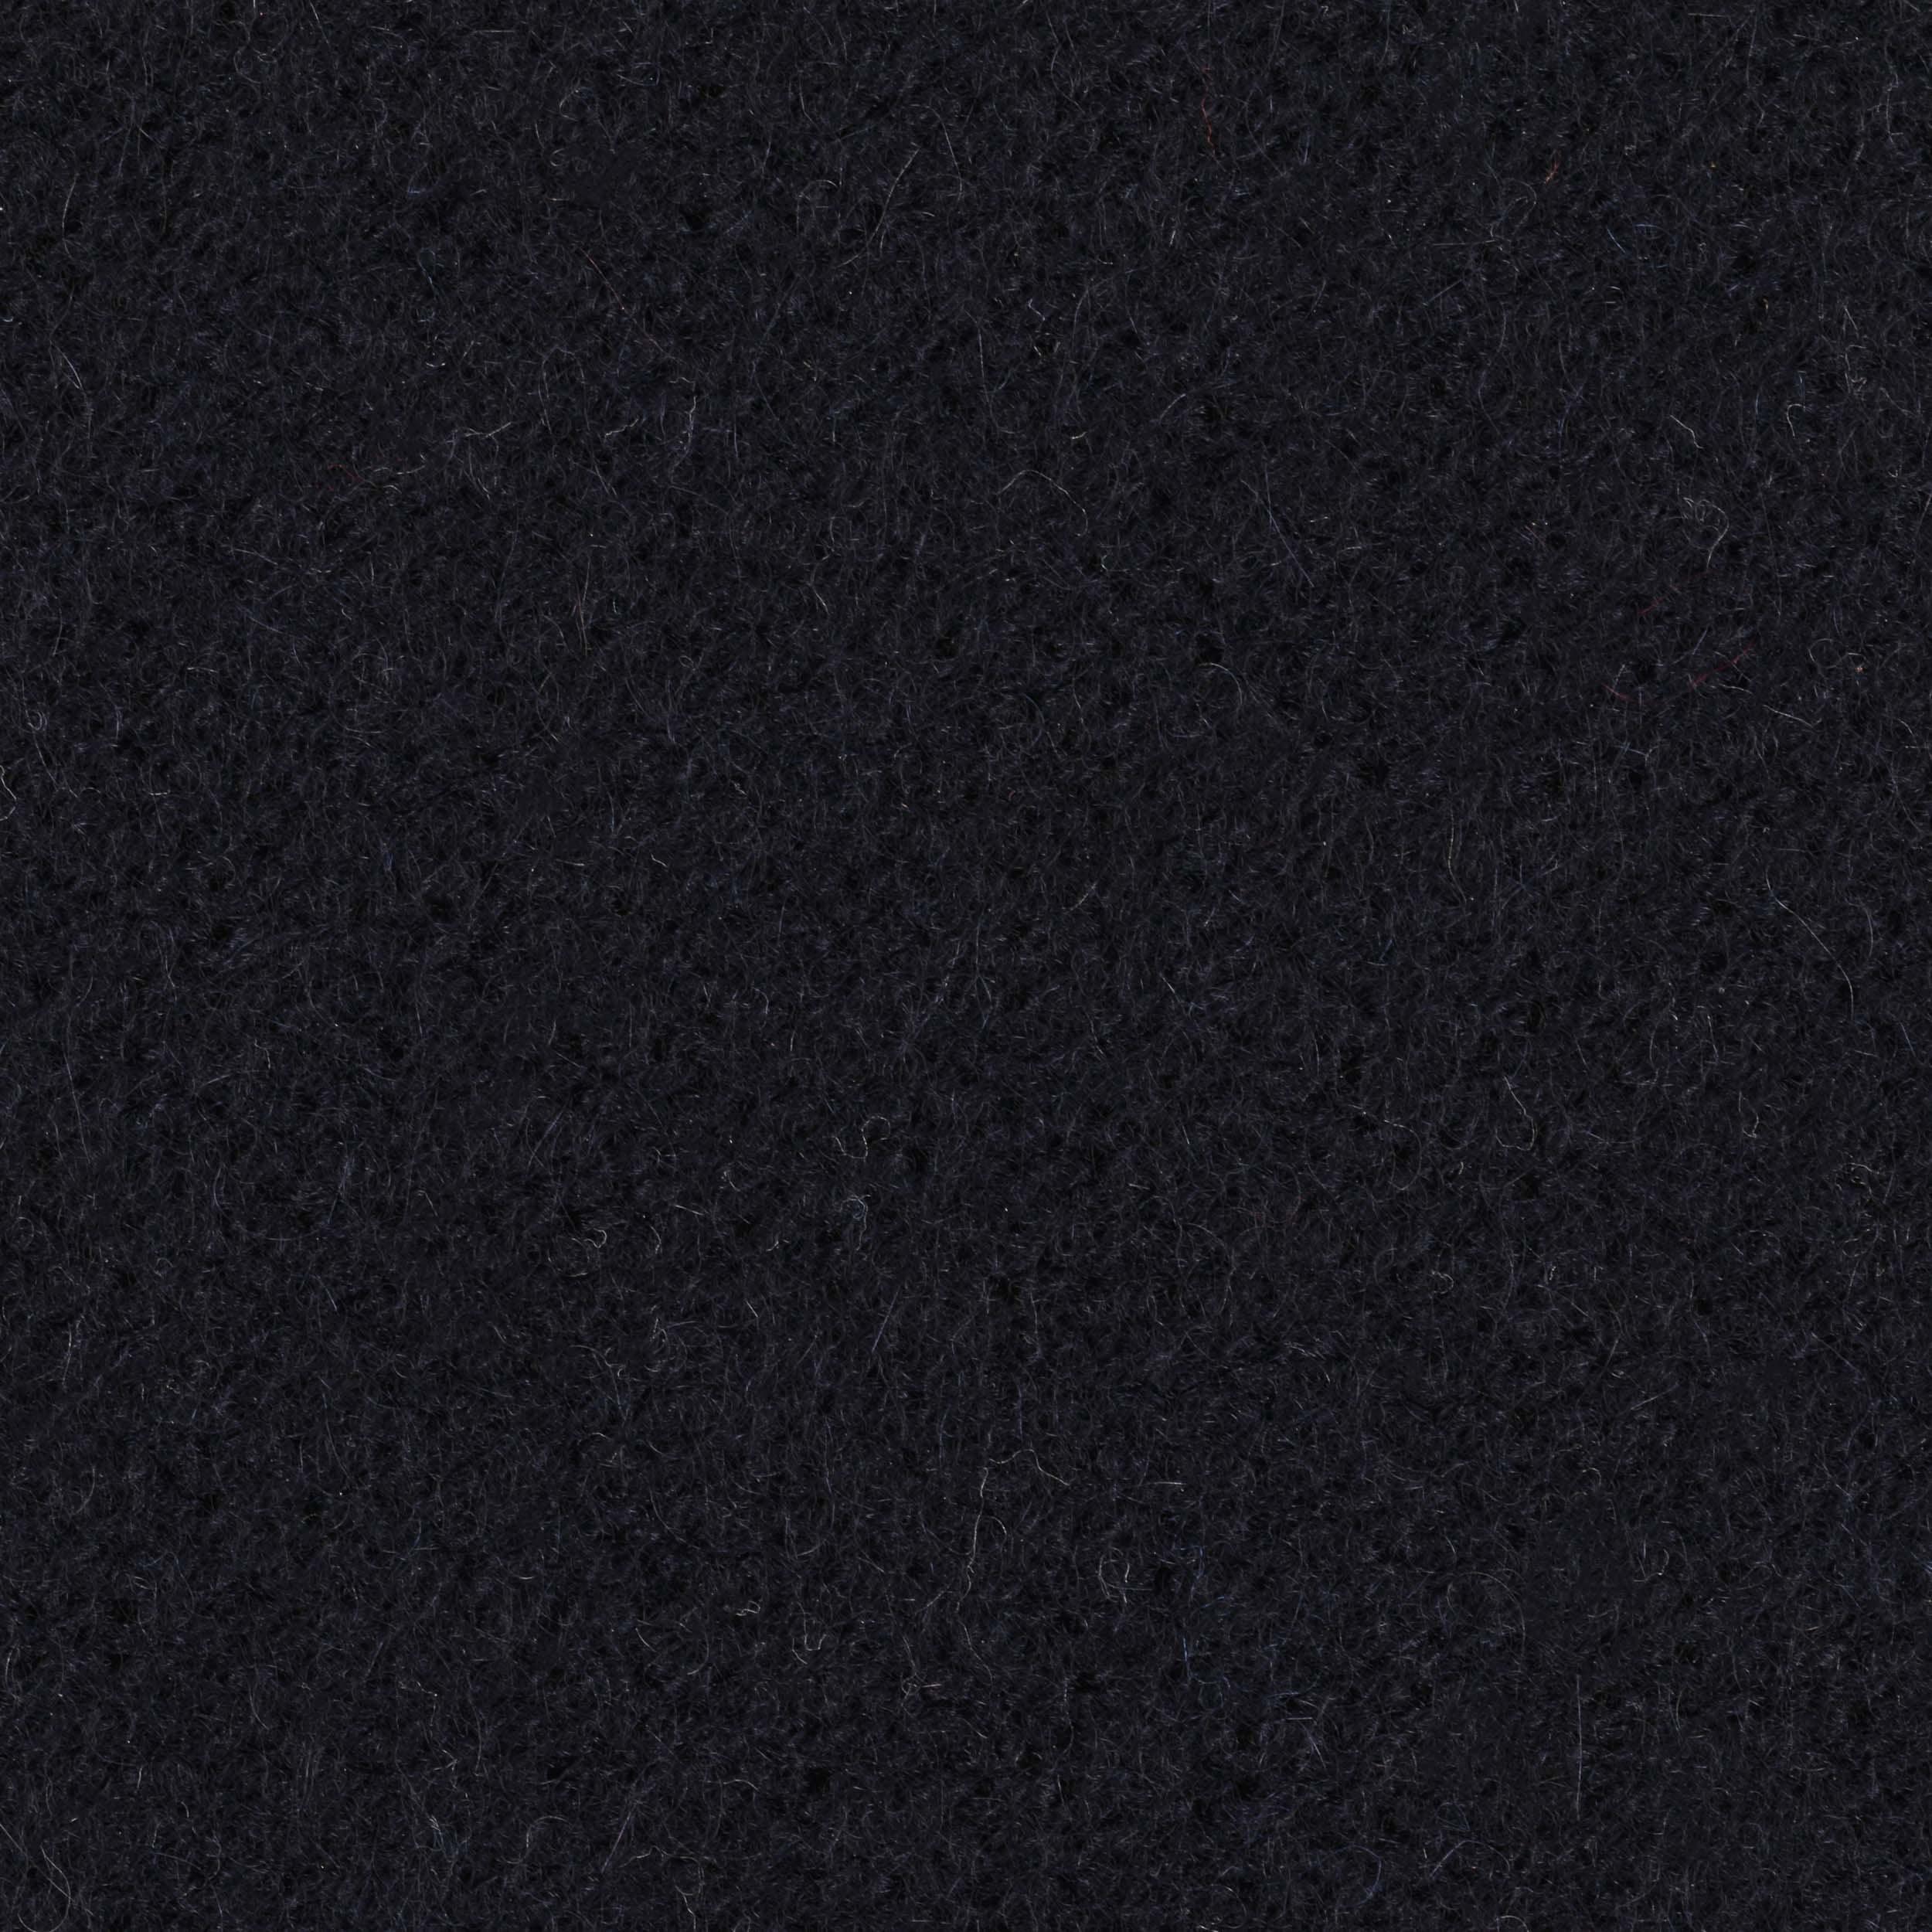 ... Sciarpa a Maglia Cashmere Wool by Stetson - blu scuro 1 ... 51ddde00f4cb